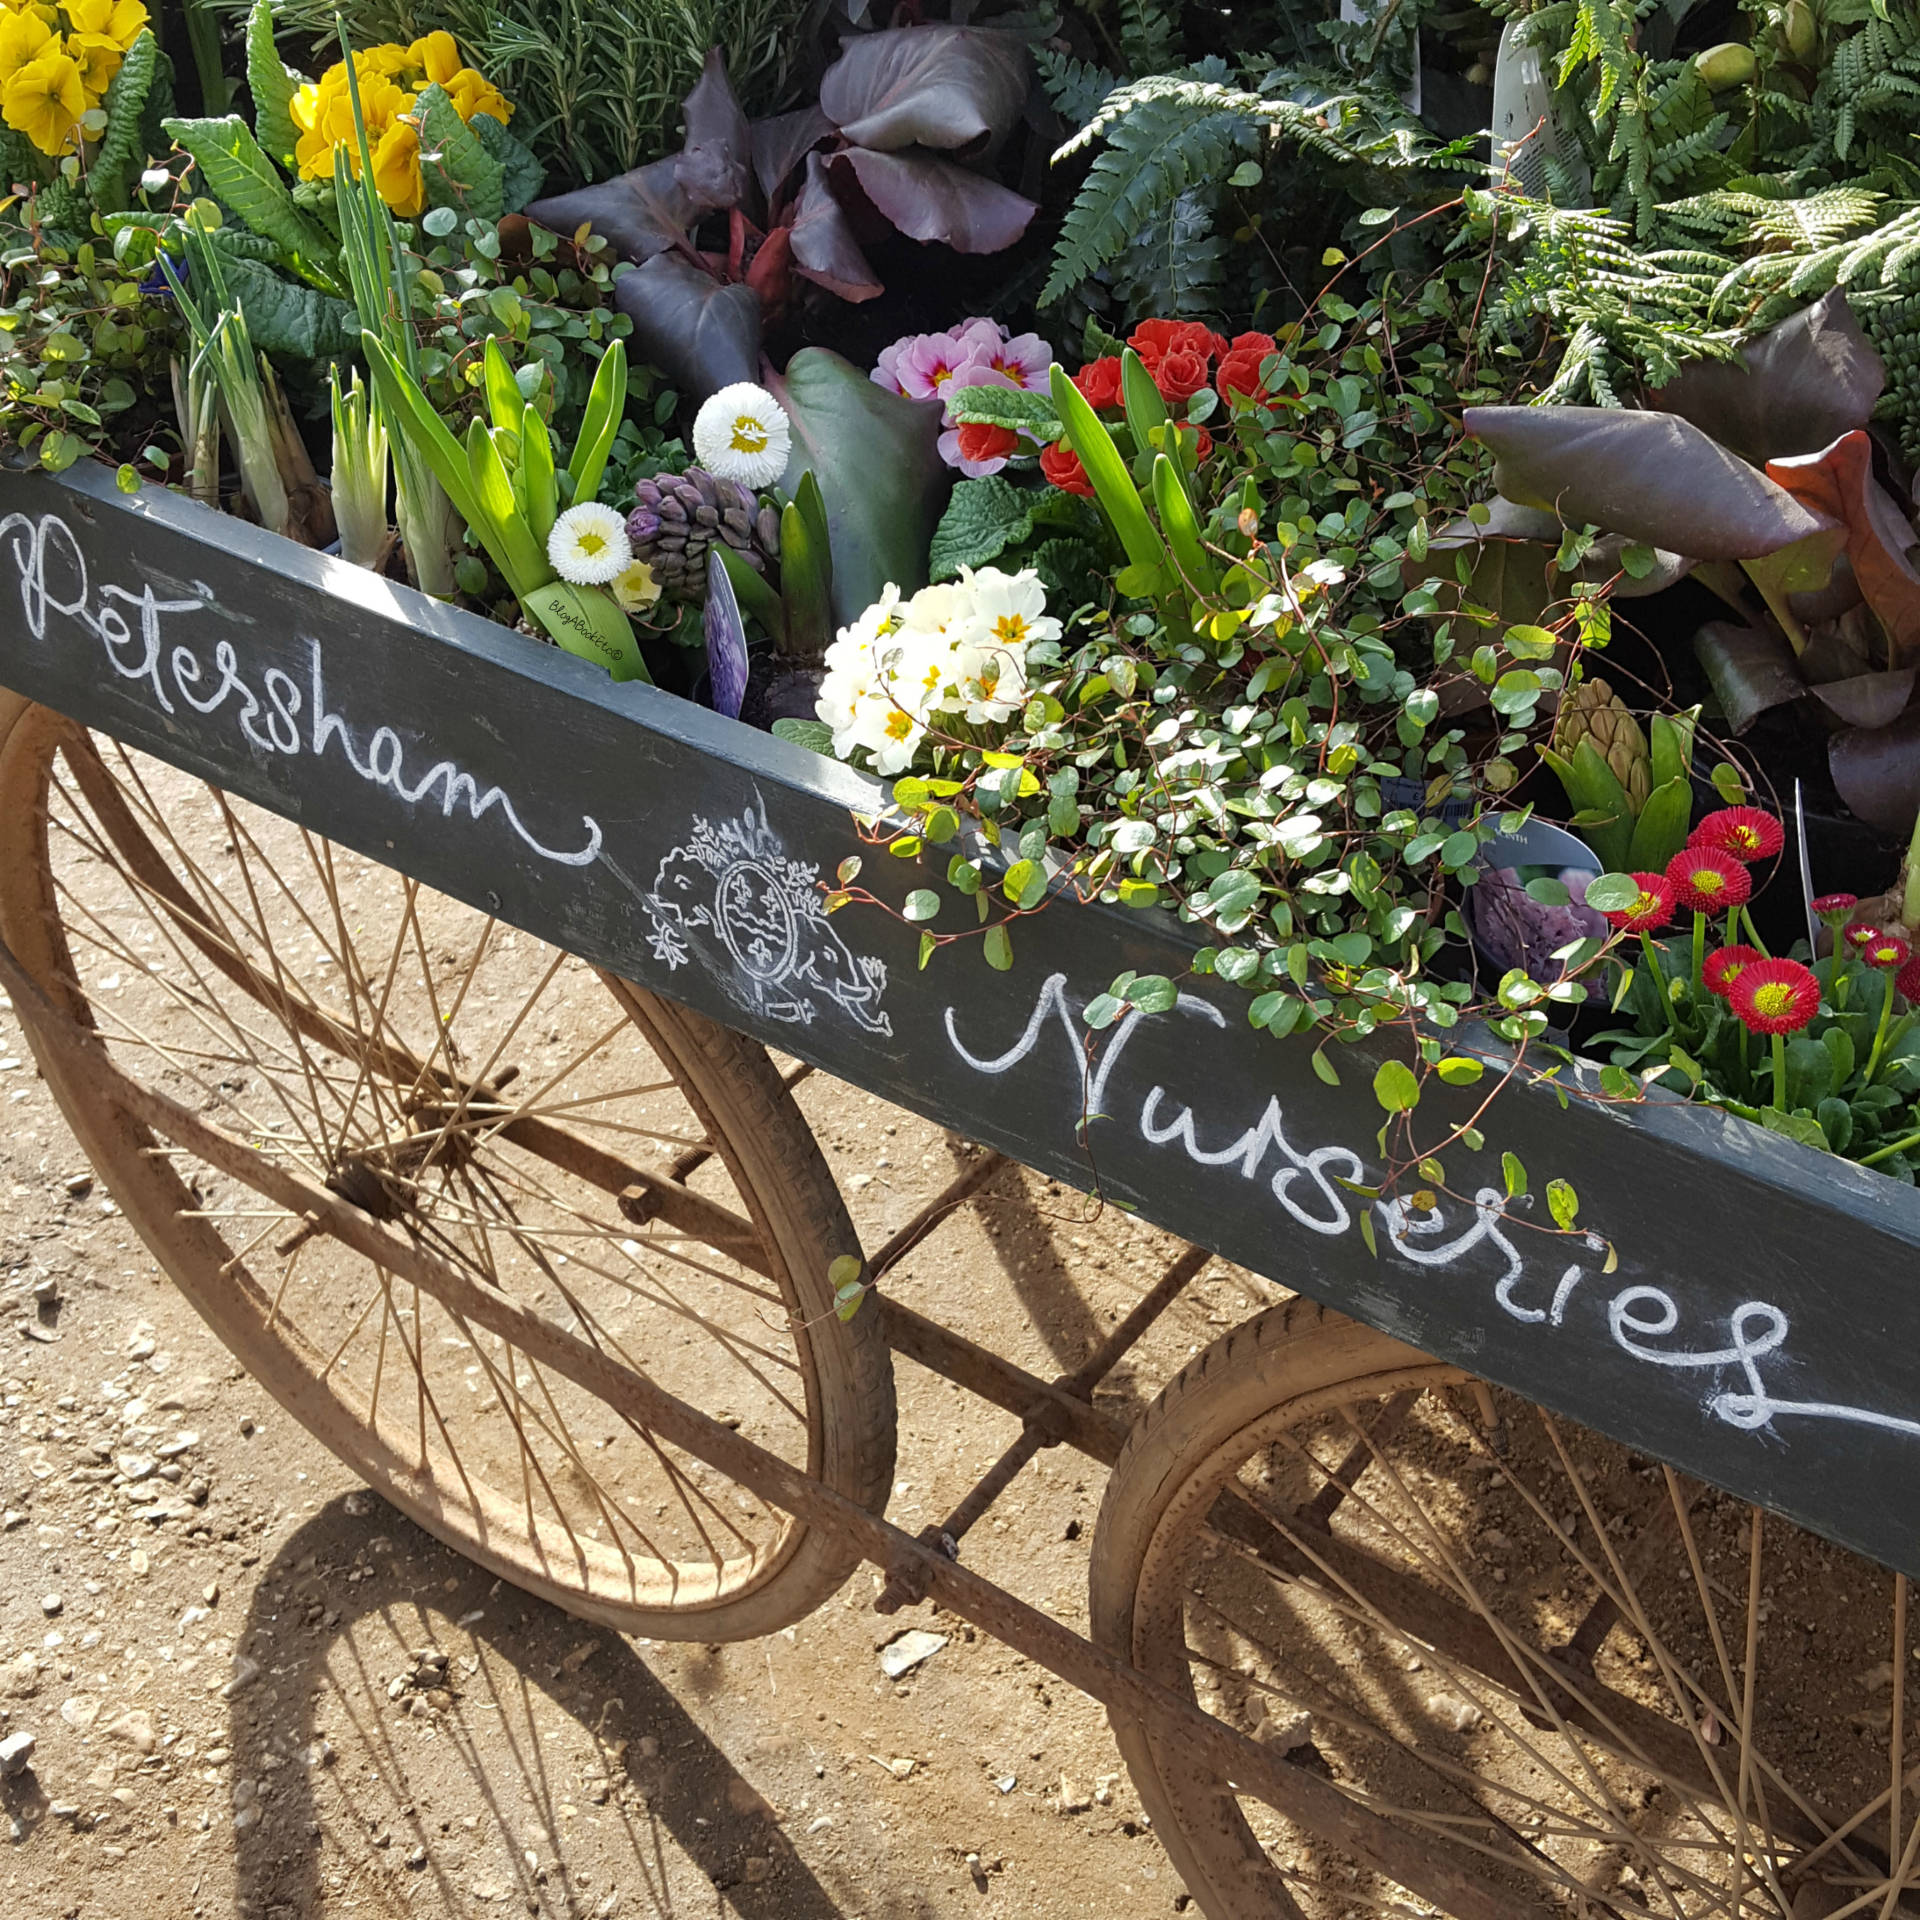 Petersham Nurseries, Petersham, Richmond, London, Surrey, Flowers, Plants, Succulents, Cacti, Cactus, Bedding Plants, Nurseries, Garden, Gardening, Summer, Beautiful, Beauty, Blogger, Life, Lifestyle, Blog A Book Etc, Fay